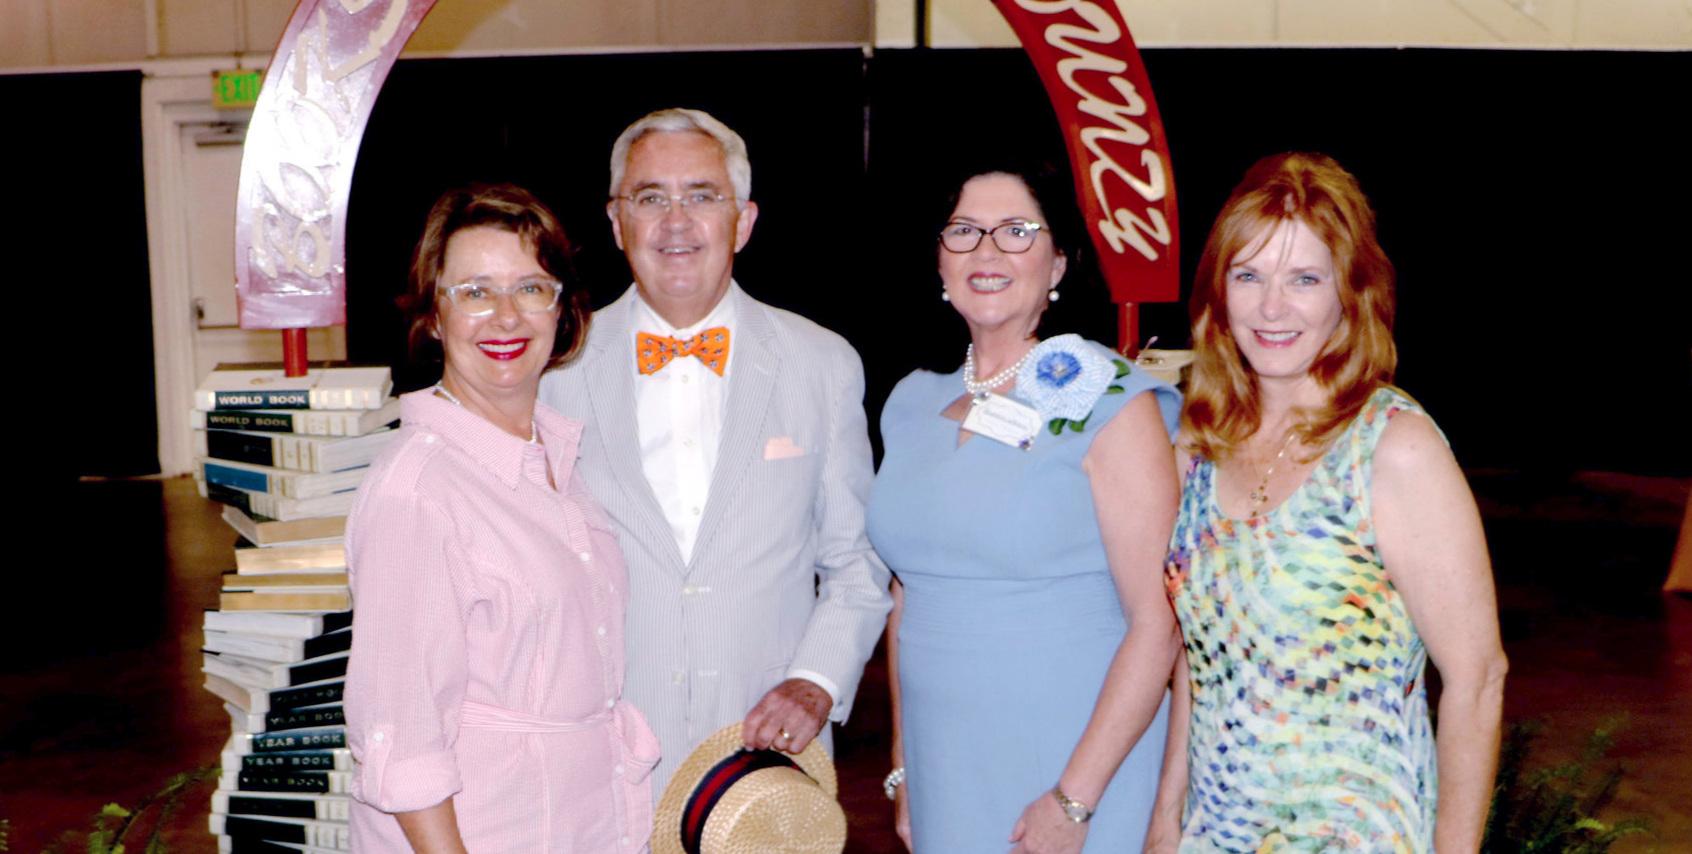 Claudia & Bill Haltom, Elaine Christian & Linda Climer Vince